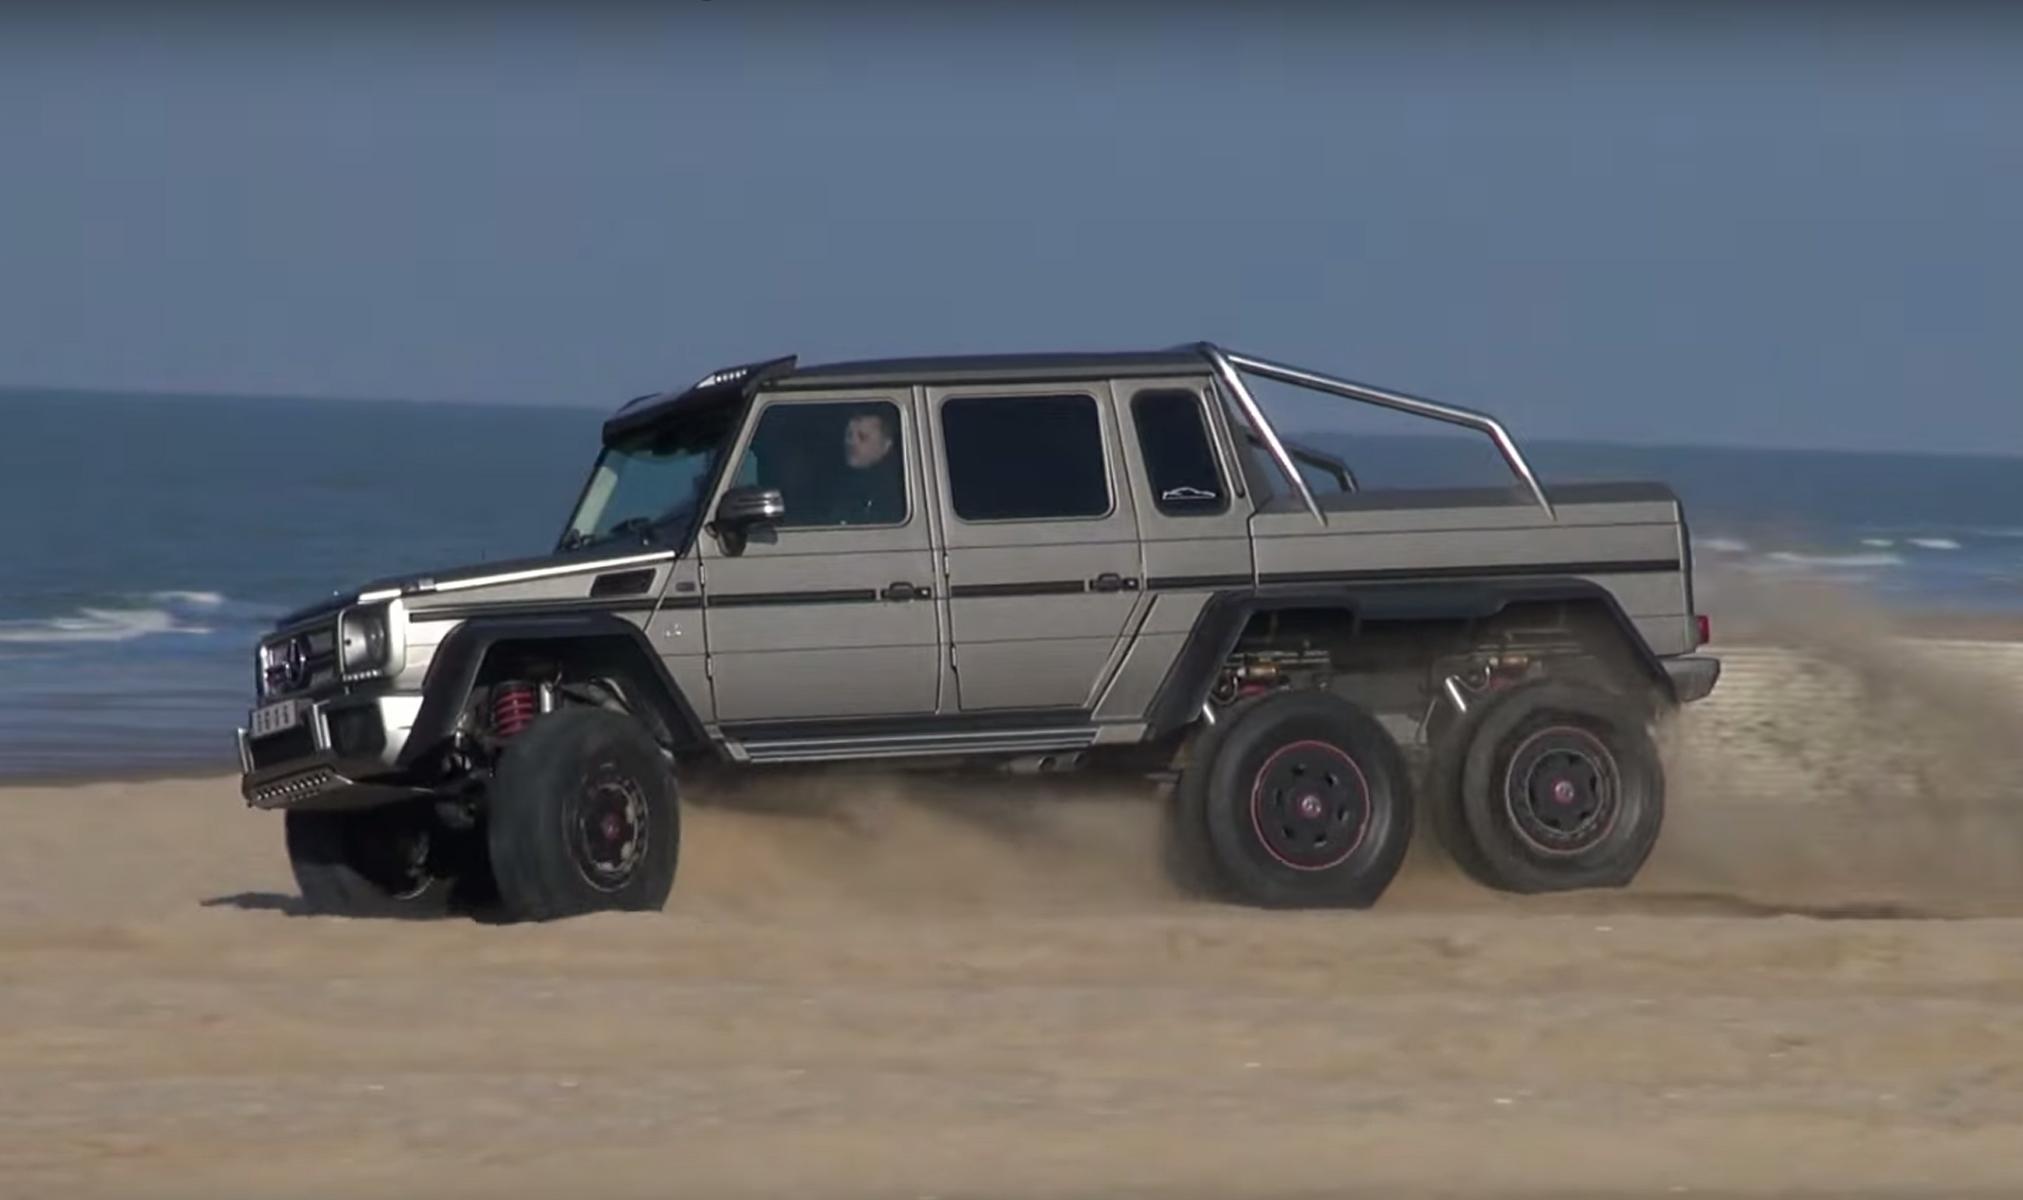 El mercedes benz amg 6x6 por la playa revista de coches for Mercedes benz 6x6 precio